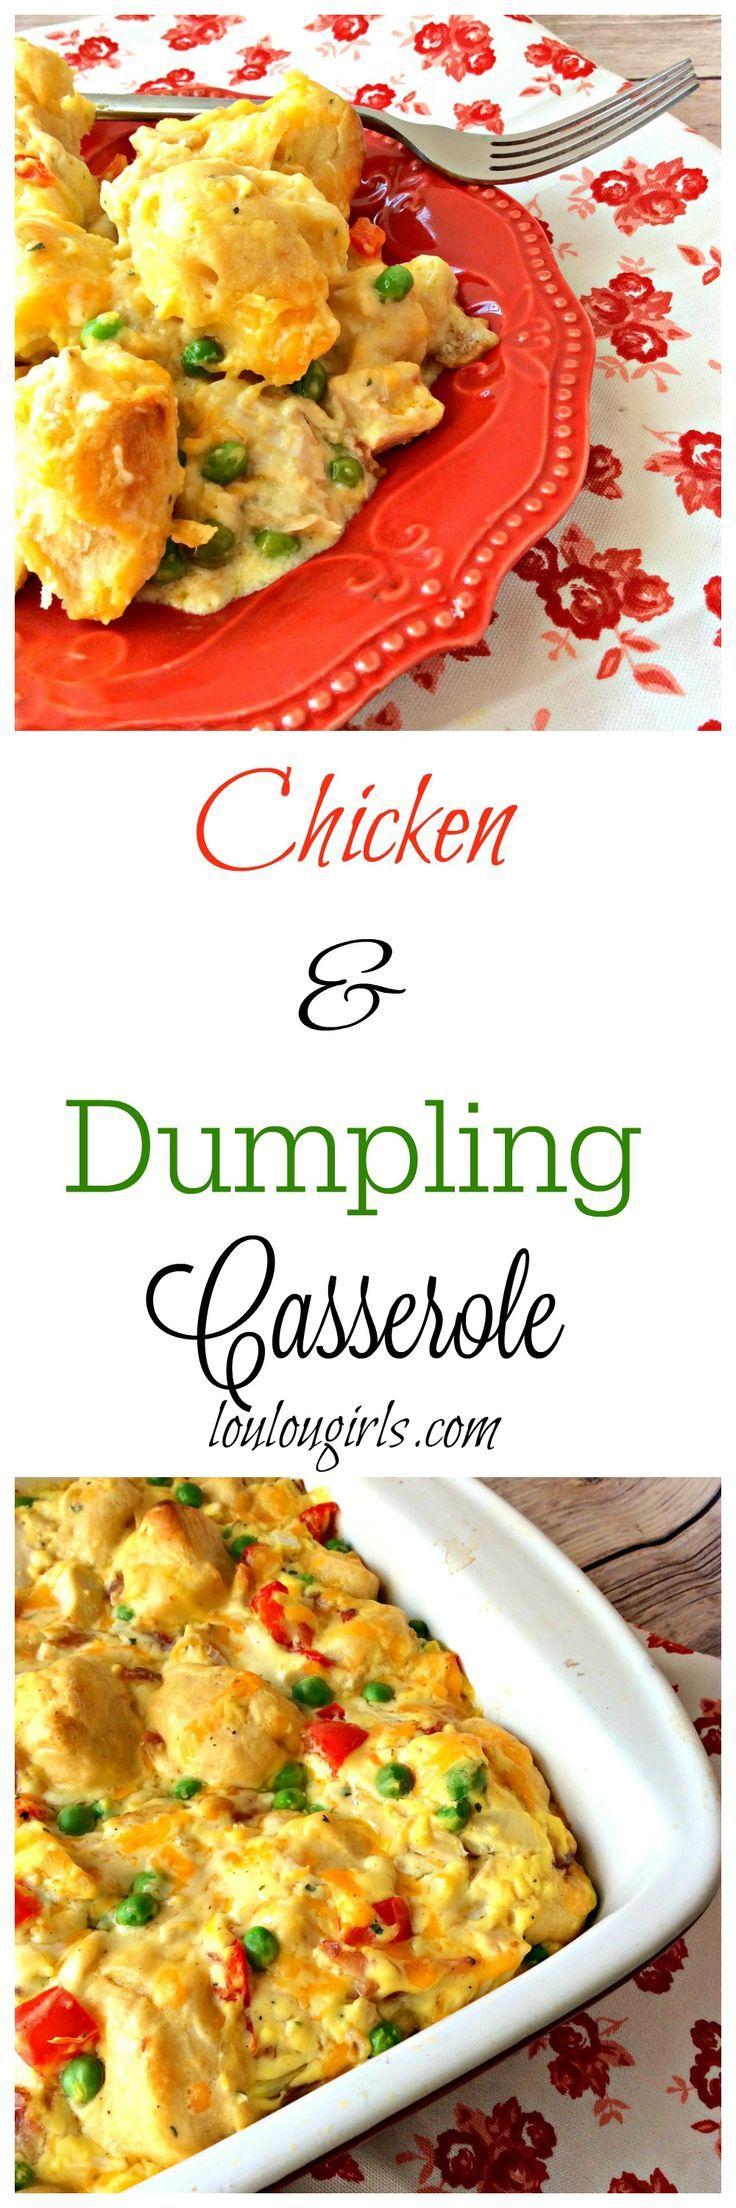 chicken and dumpling casserole collage